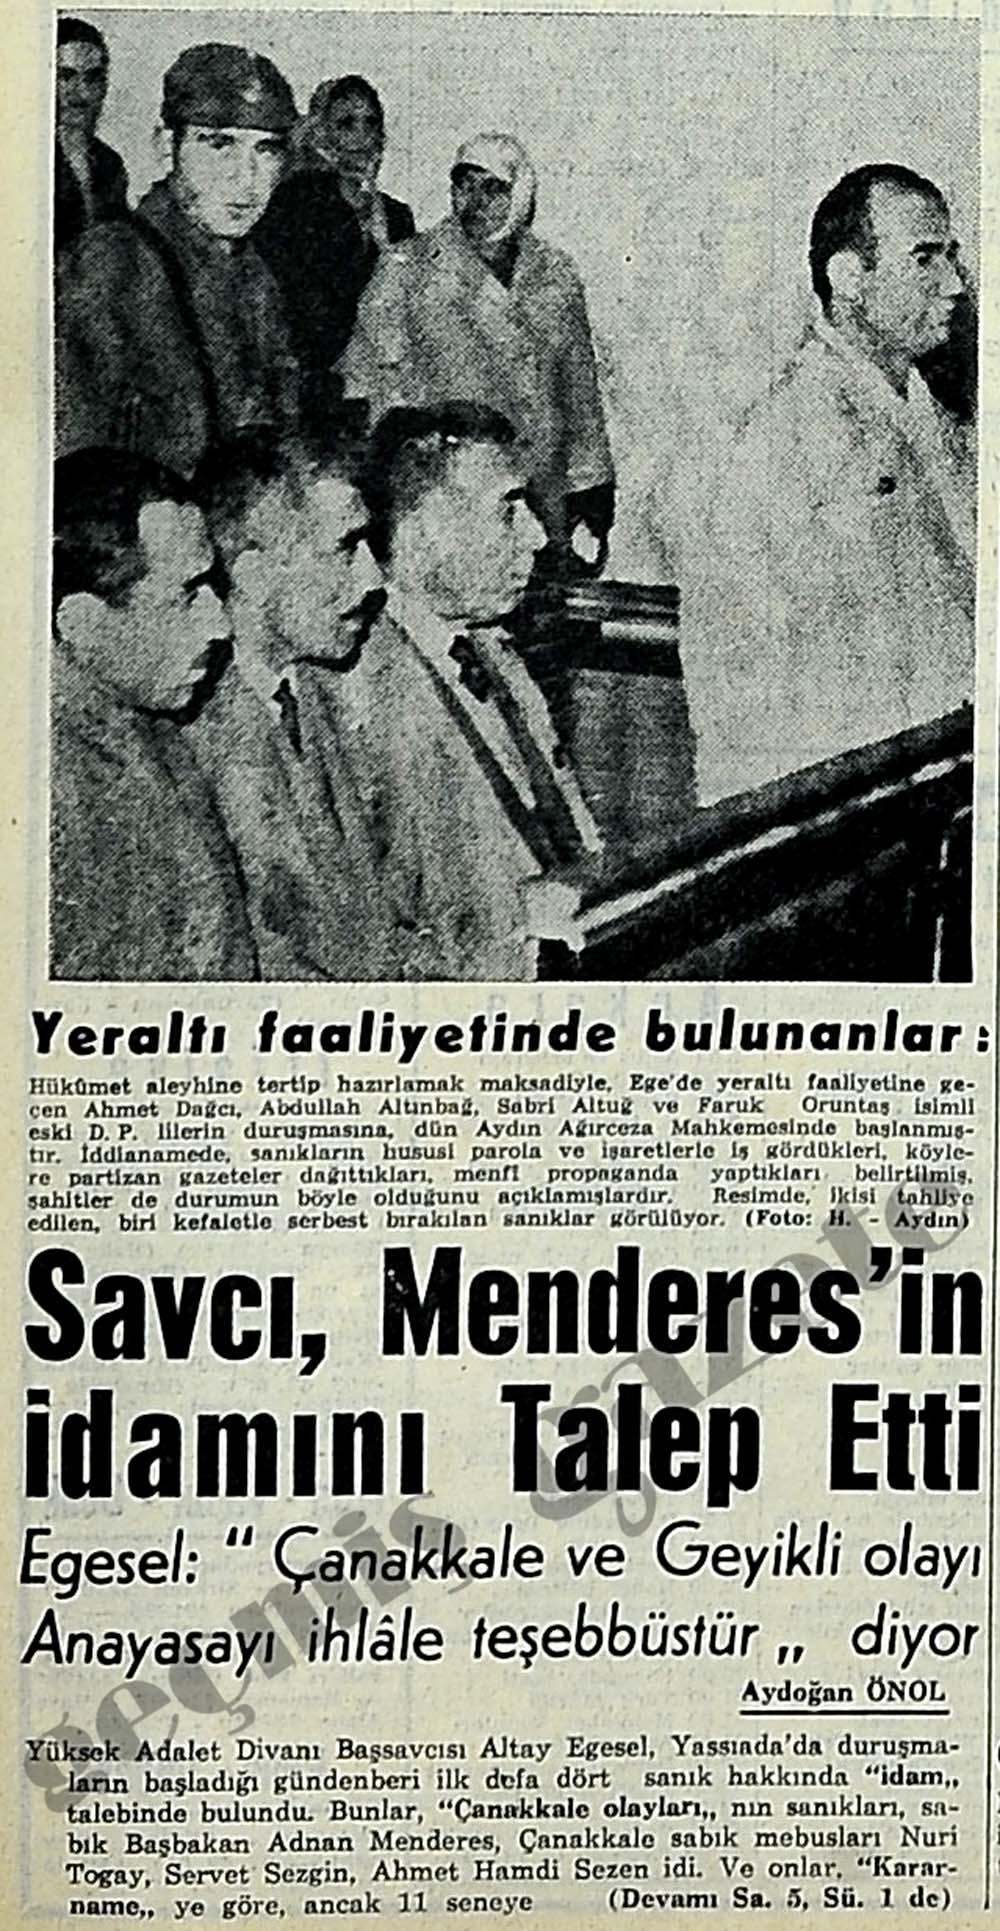 Savcı, Menderes'in idamını Talep Etti